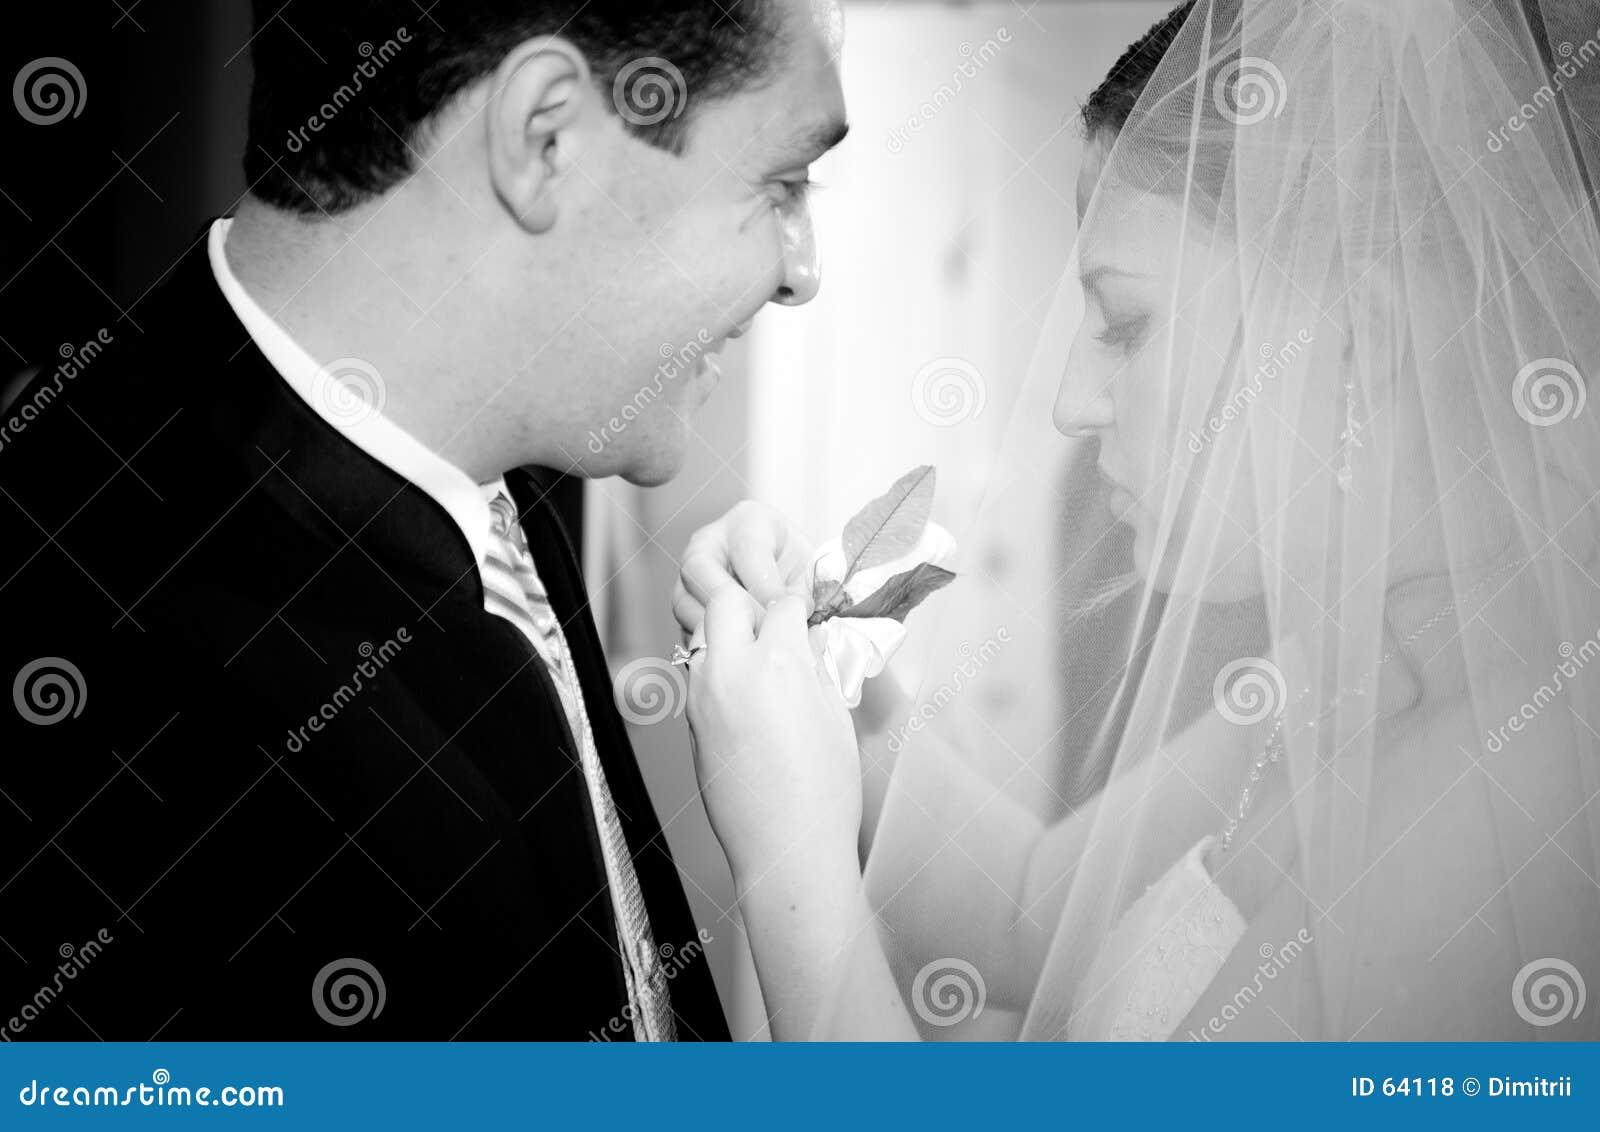 Download νεόνυμφος νυφών στοκ εικόνες. εικόνα από nuptials, έναρξη - 64118